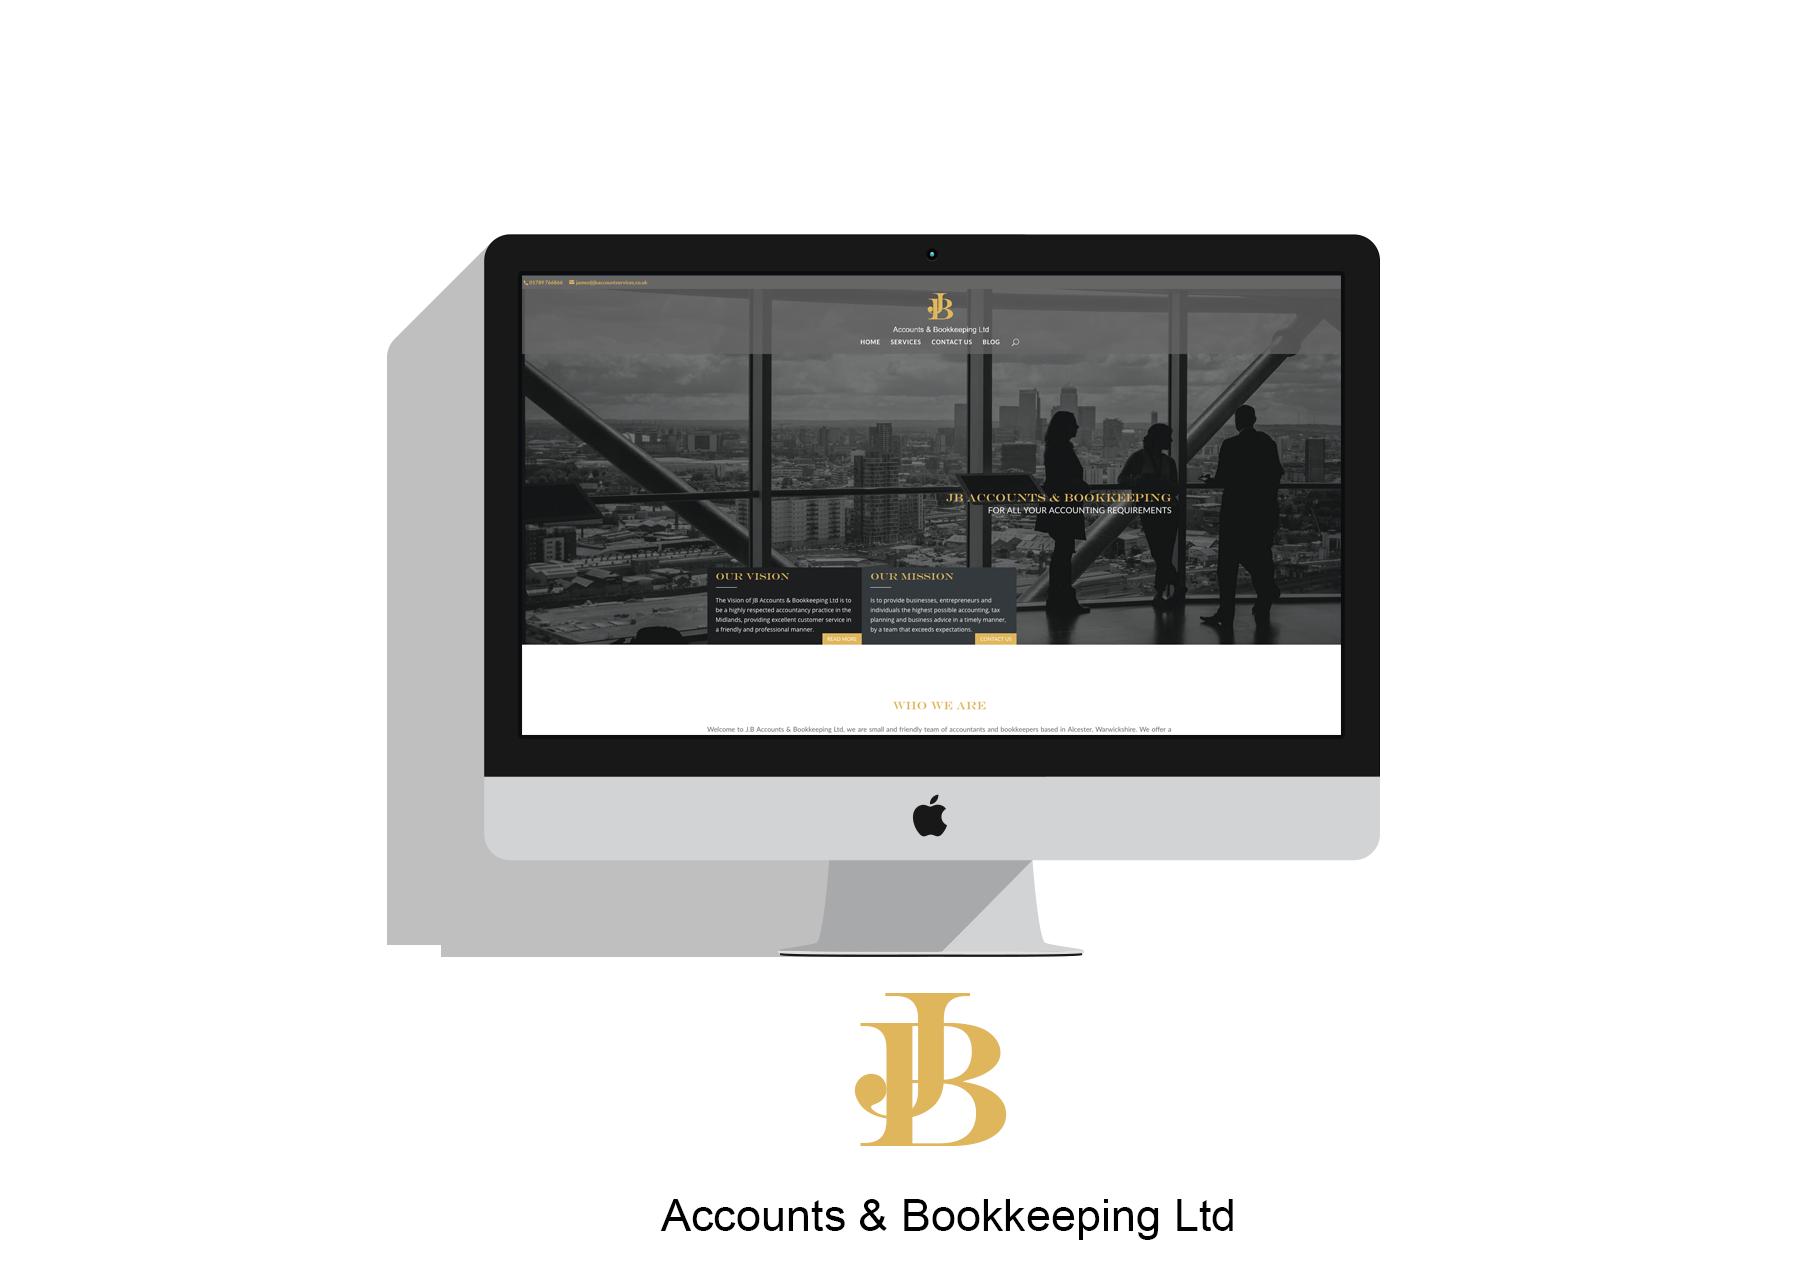 Mock up of JB Accounts & Bookkeeping Ltd